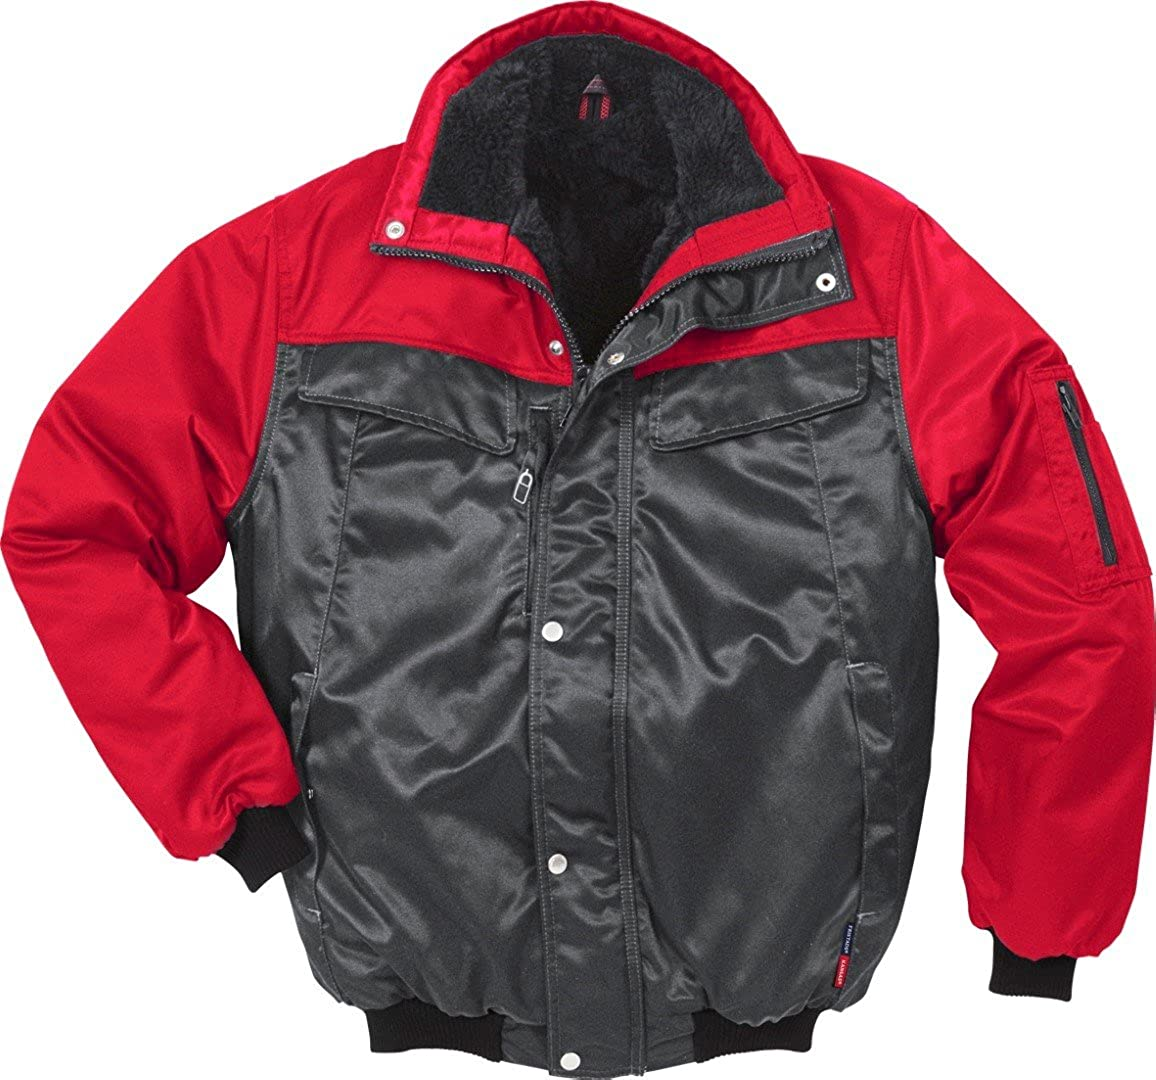 Fristads Kansas Workwear 100809 Pilot Jacket Grey/Red 3XL